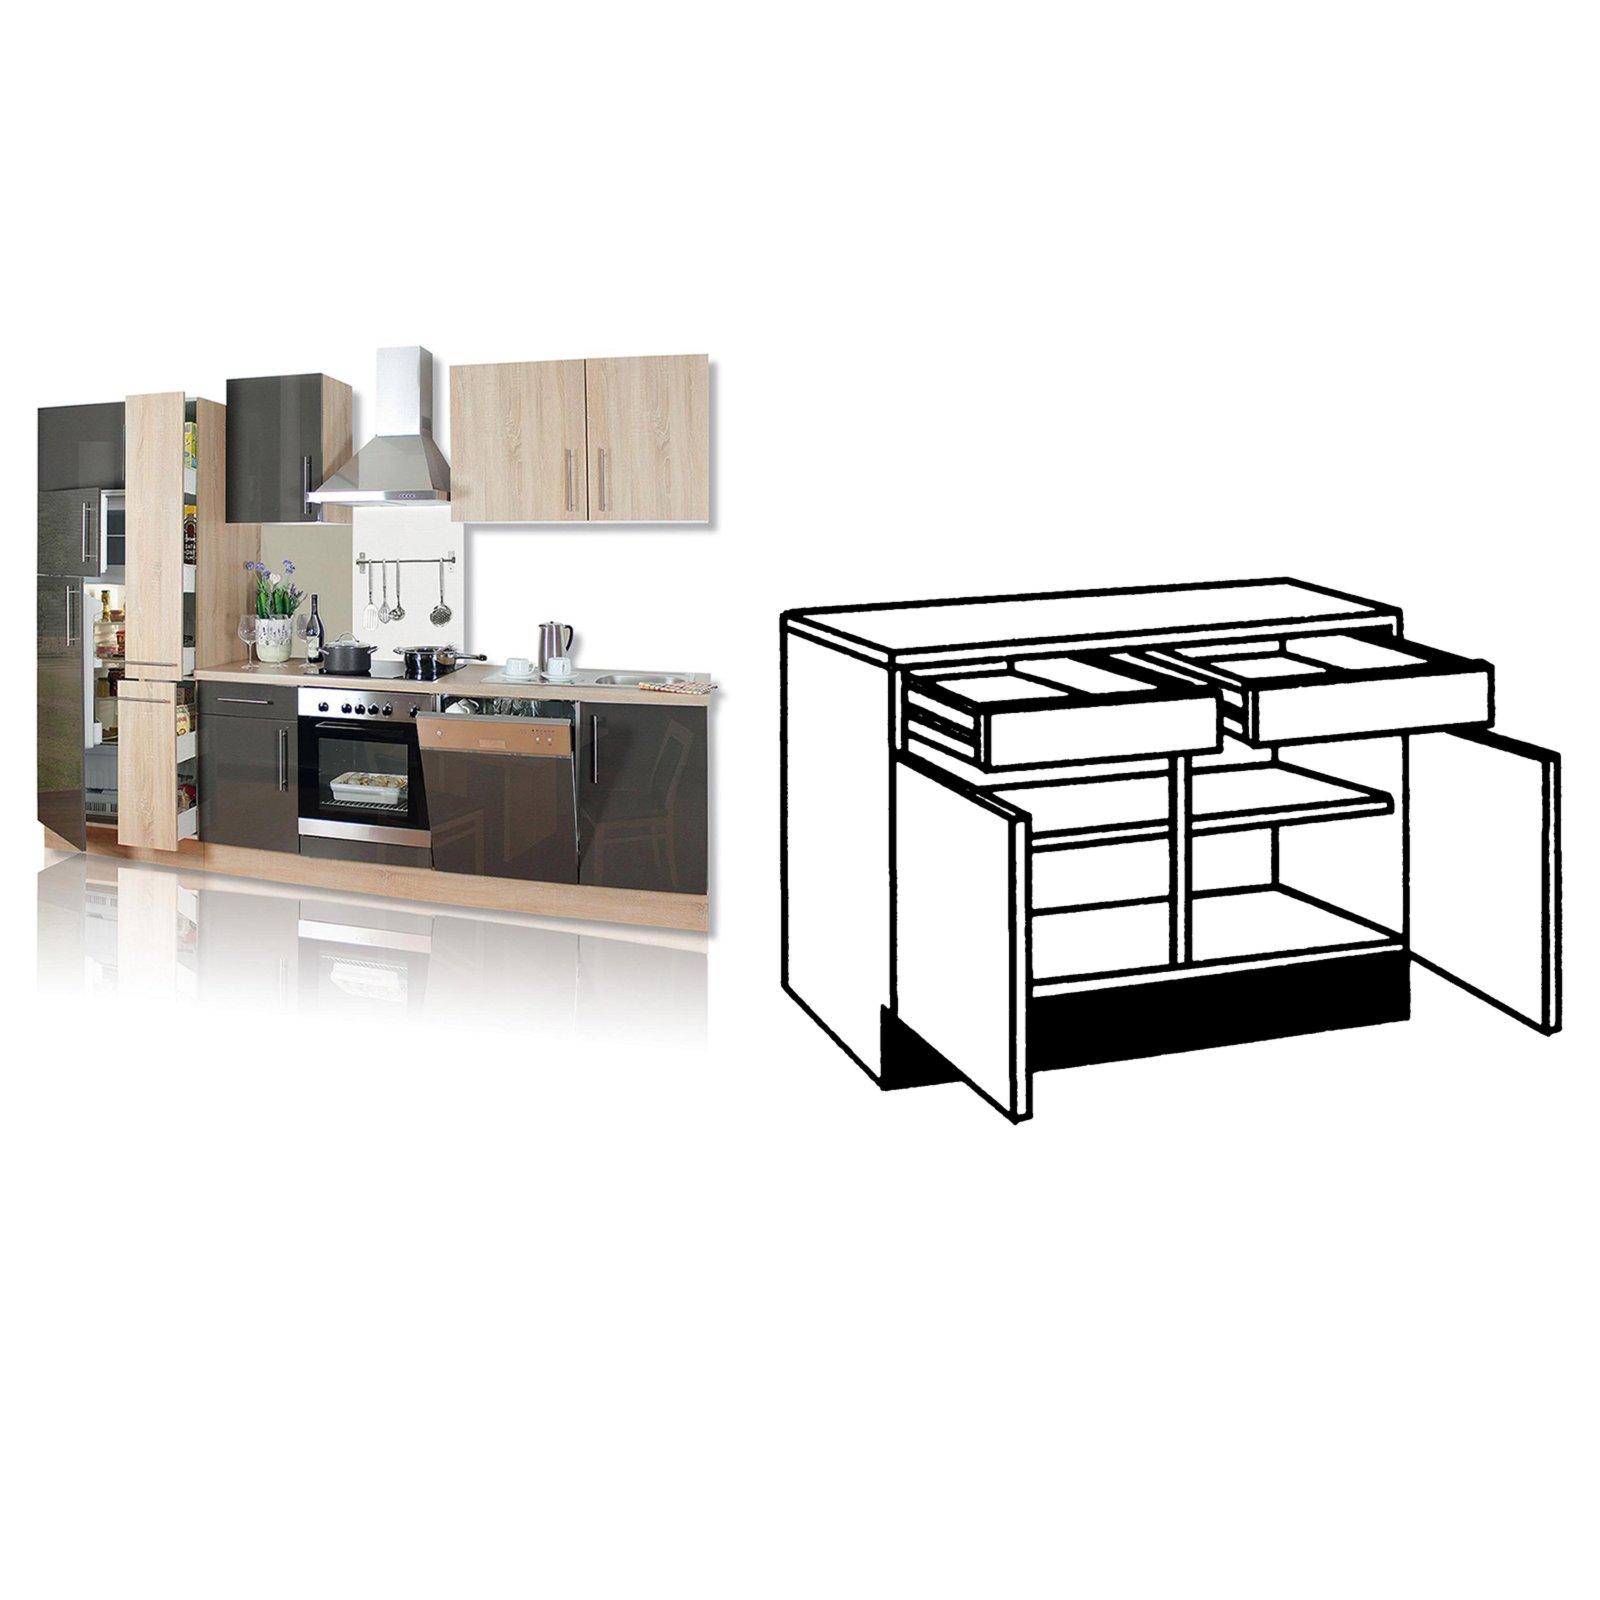 roller anrichte jana lava sonoma eiche 100 cm ebay. Black Bedroom Furniture Sets. Home Design Ideas